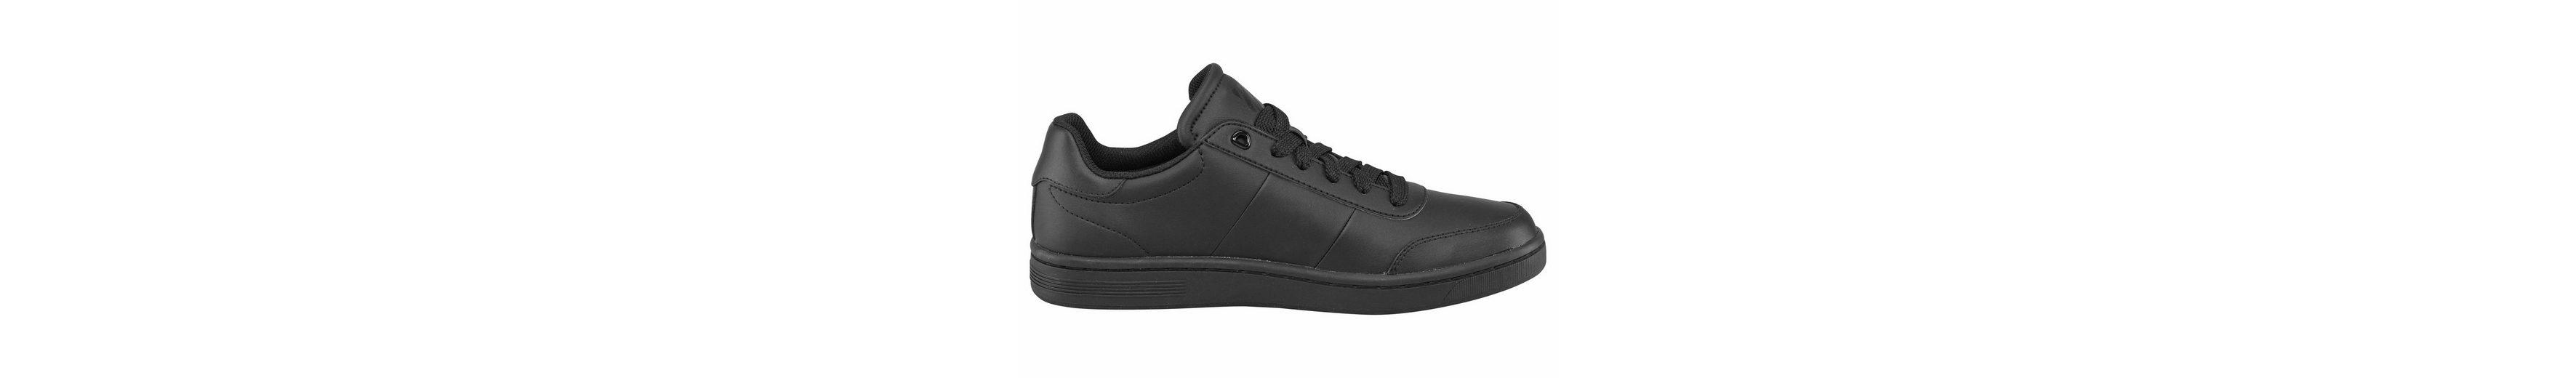 K-Swiss Court Covington Sneaker Steckdose Shop GWulaQ